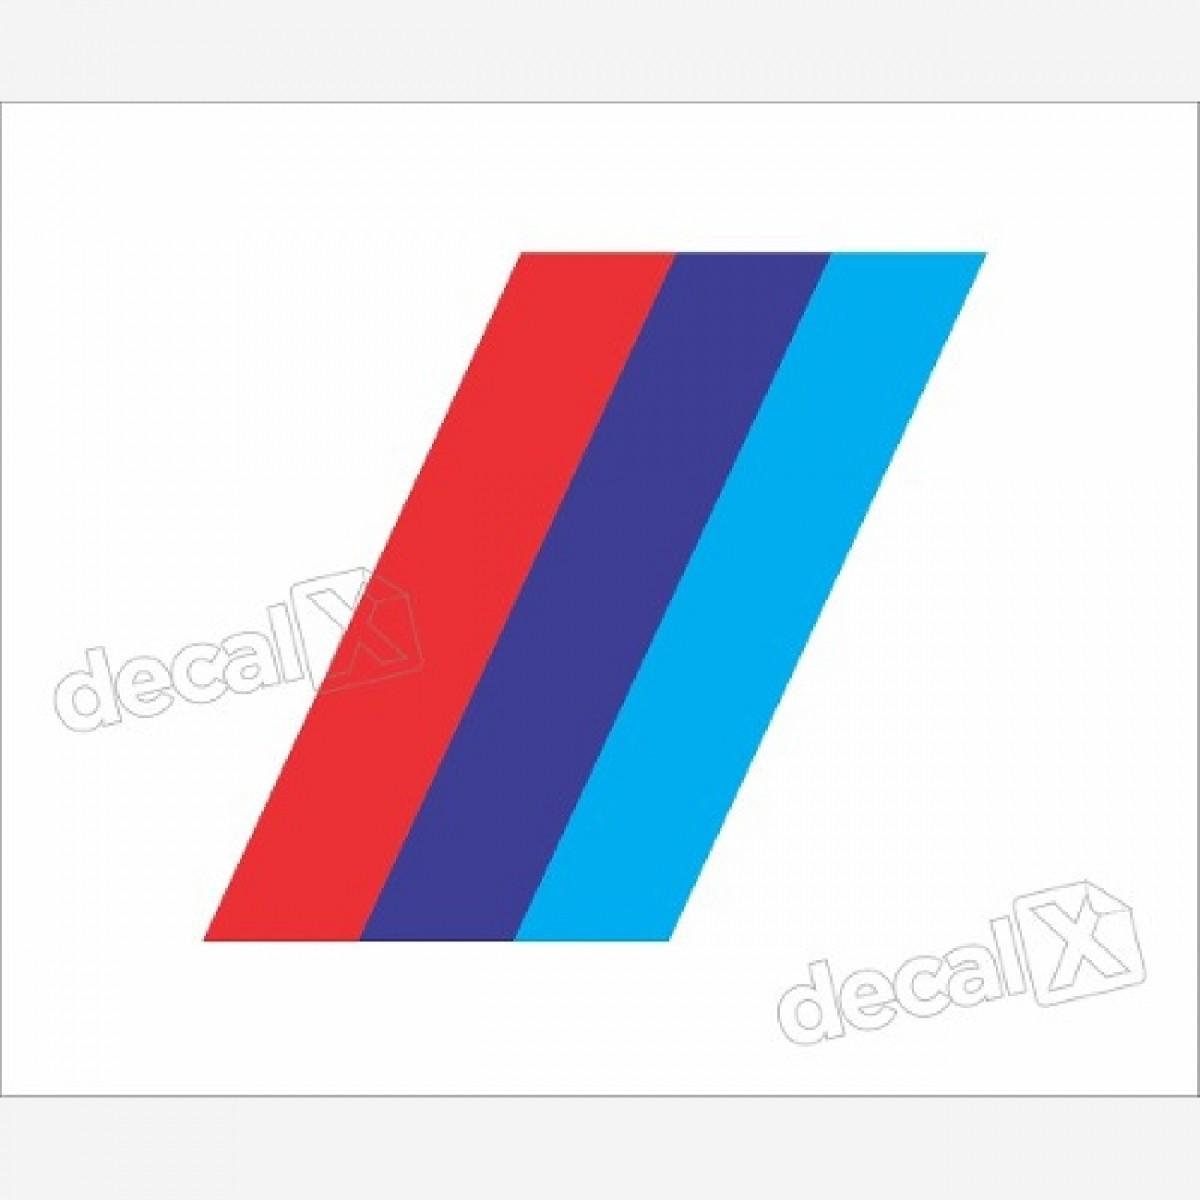 Adesivo Bmw Faixa Tricolor Caixa De Ar Decalx